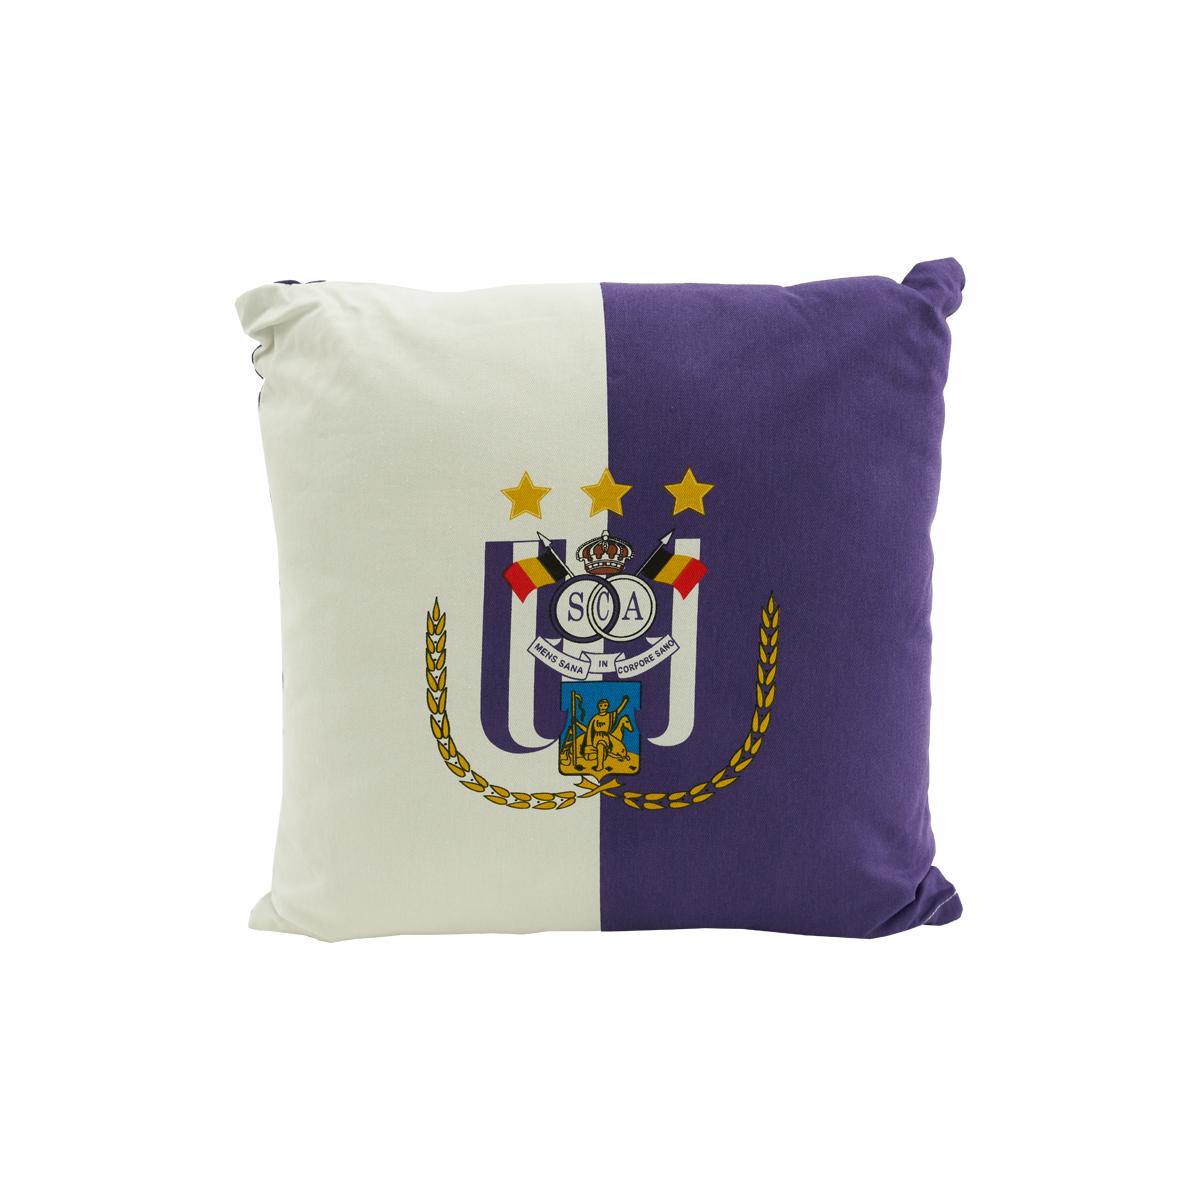 RSCA Decorative Cushion